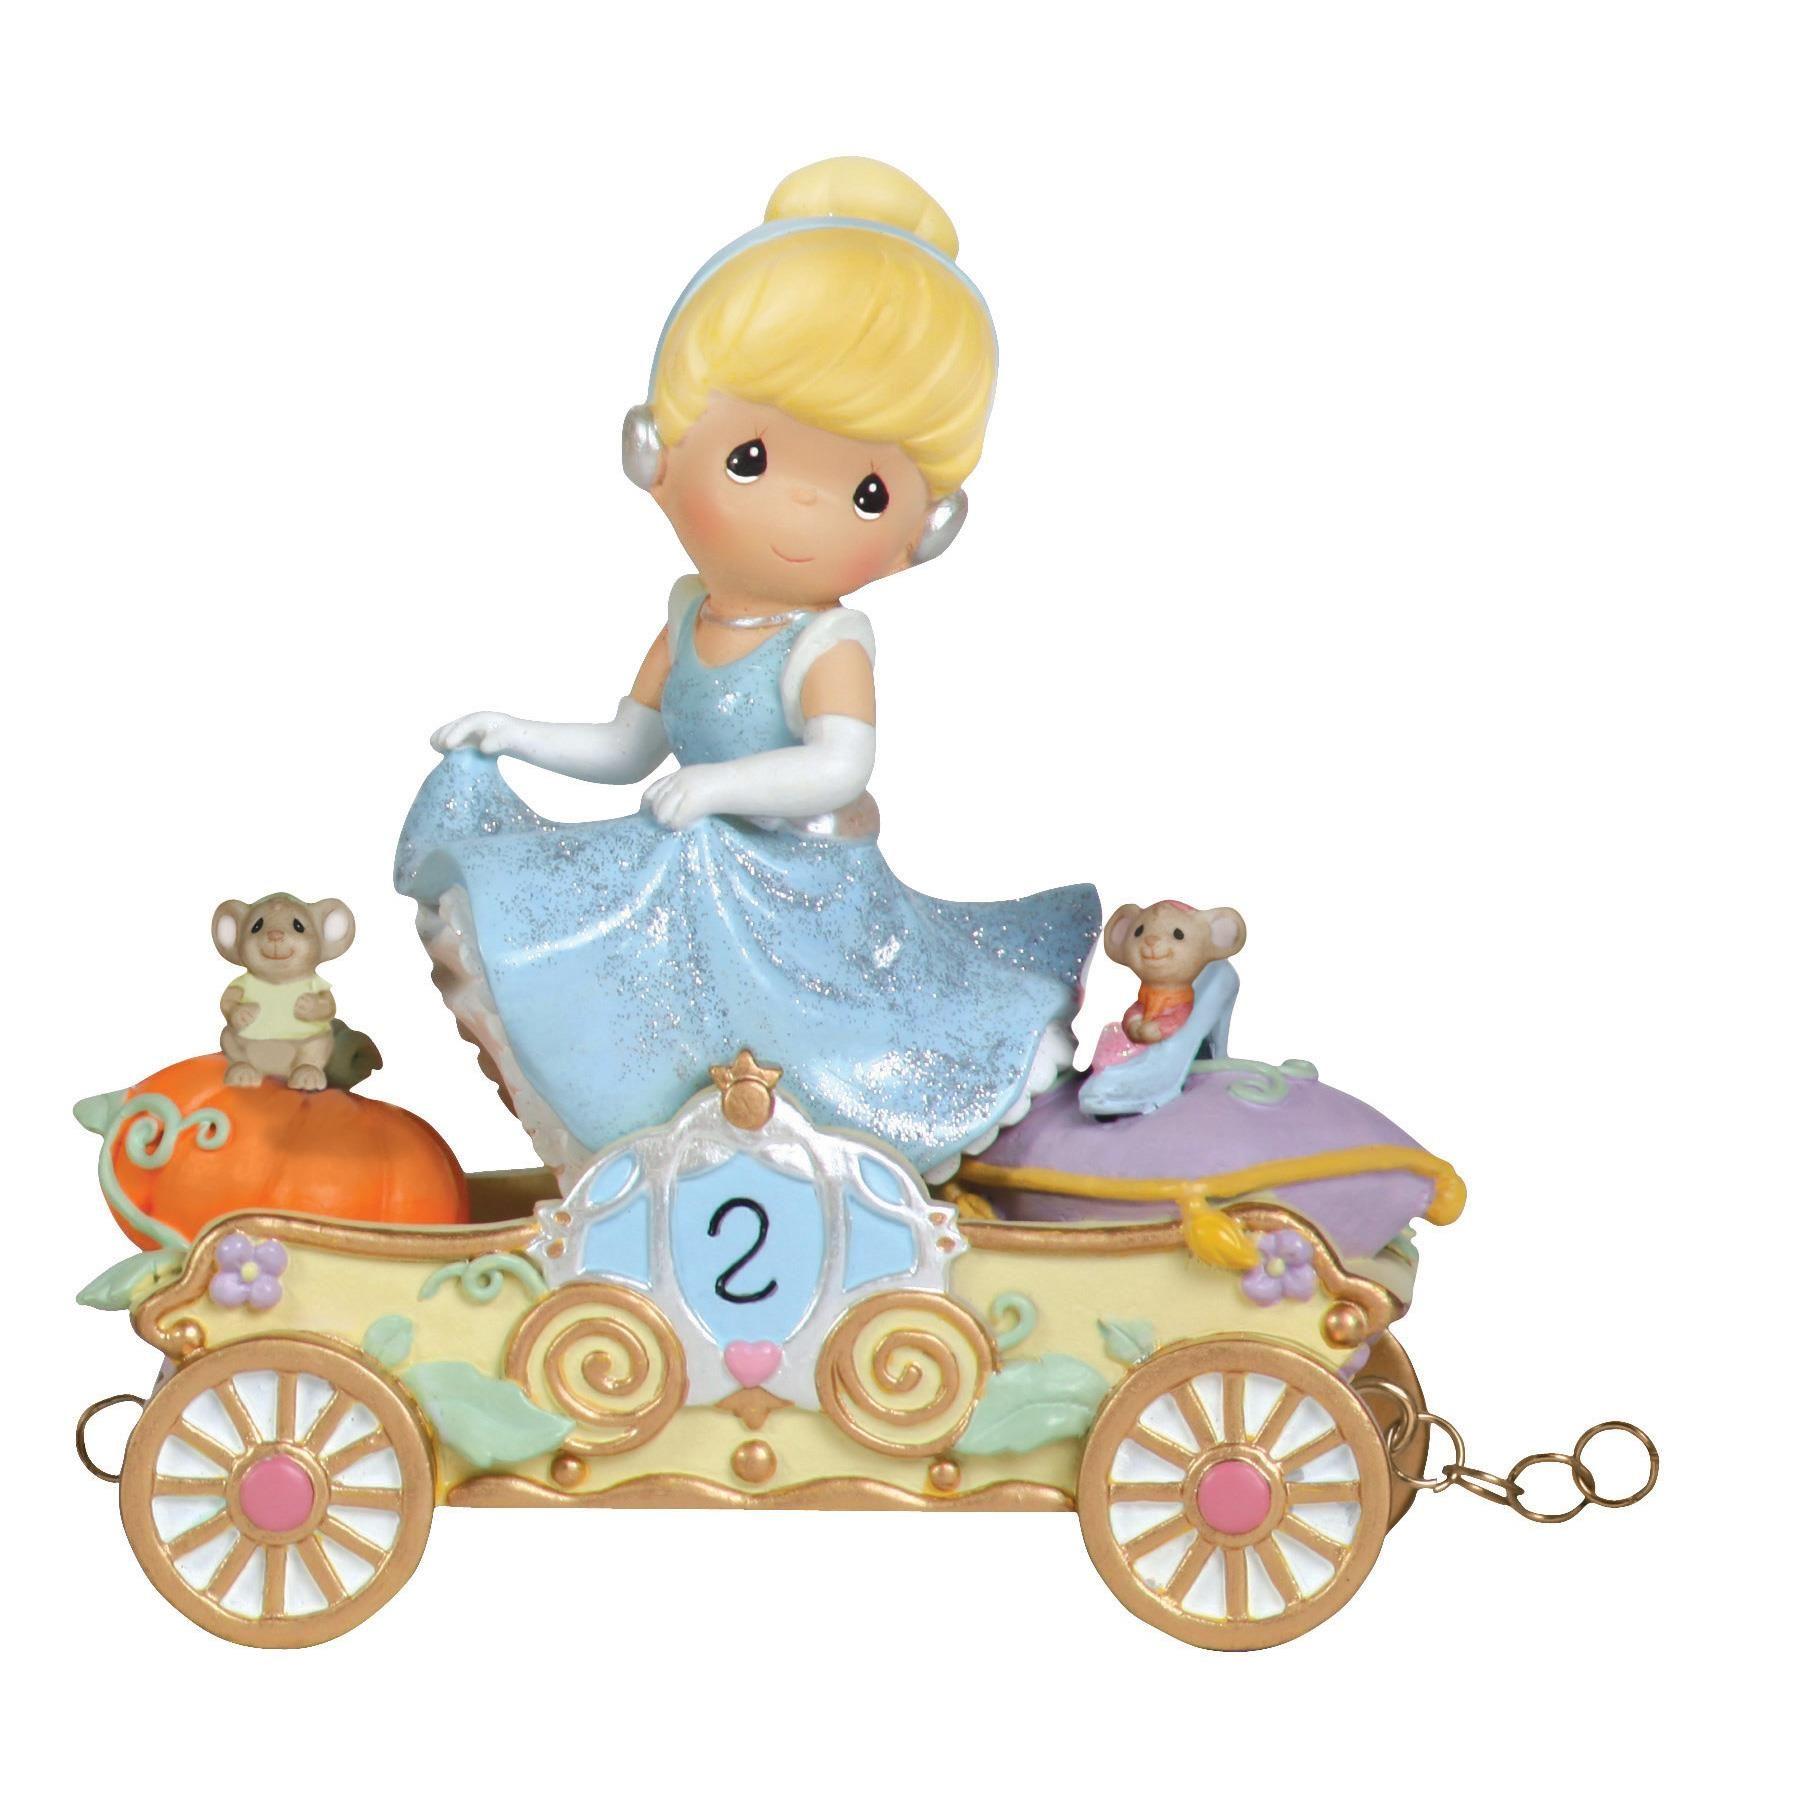 Figurine clipart concerned Disney